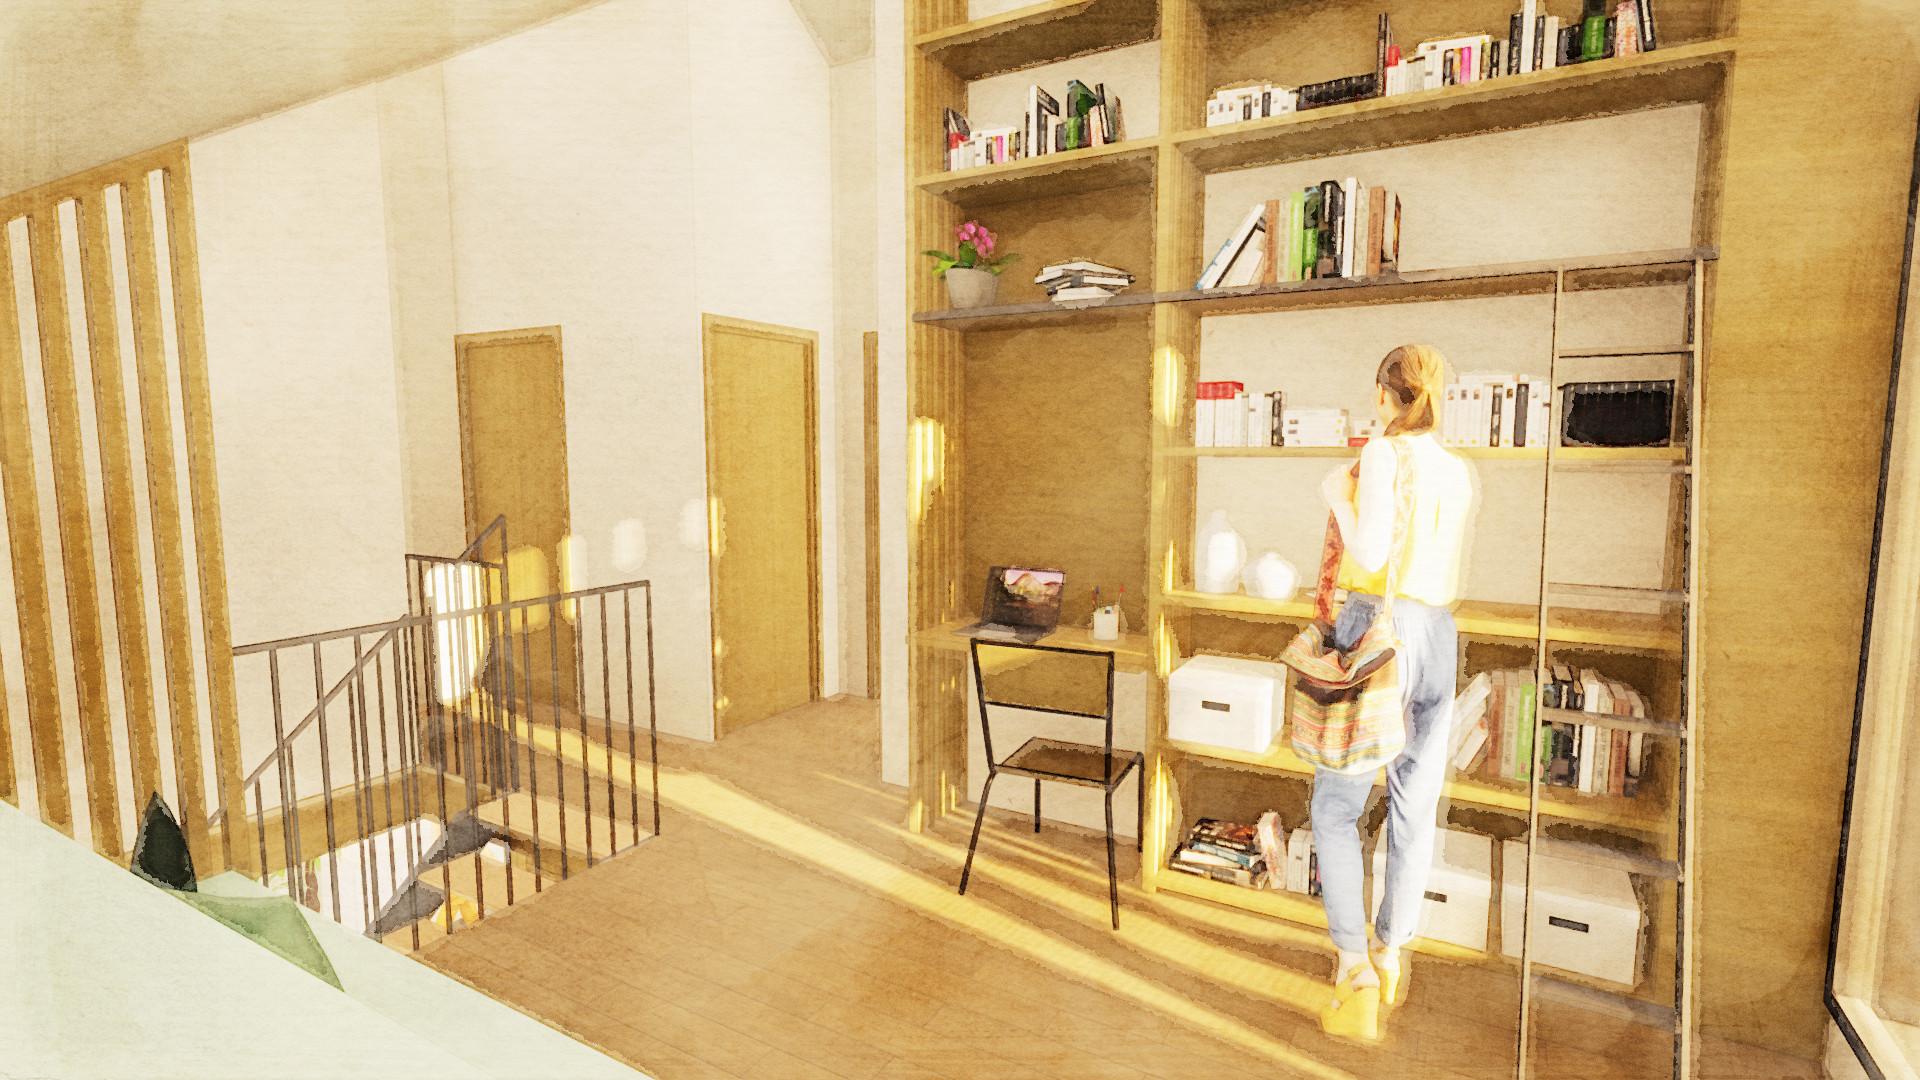 Hirundo-Architecture_Projet B&R_06.jpg